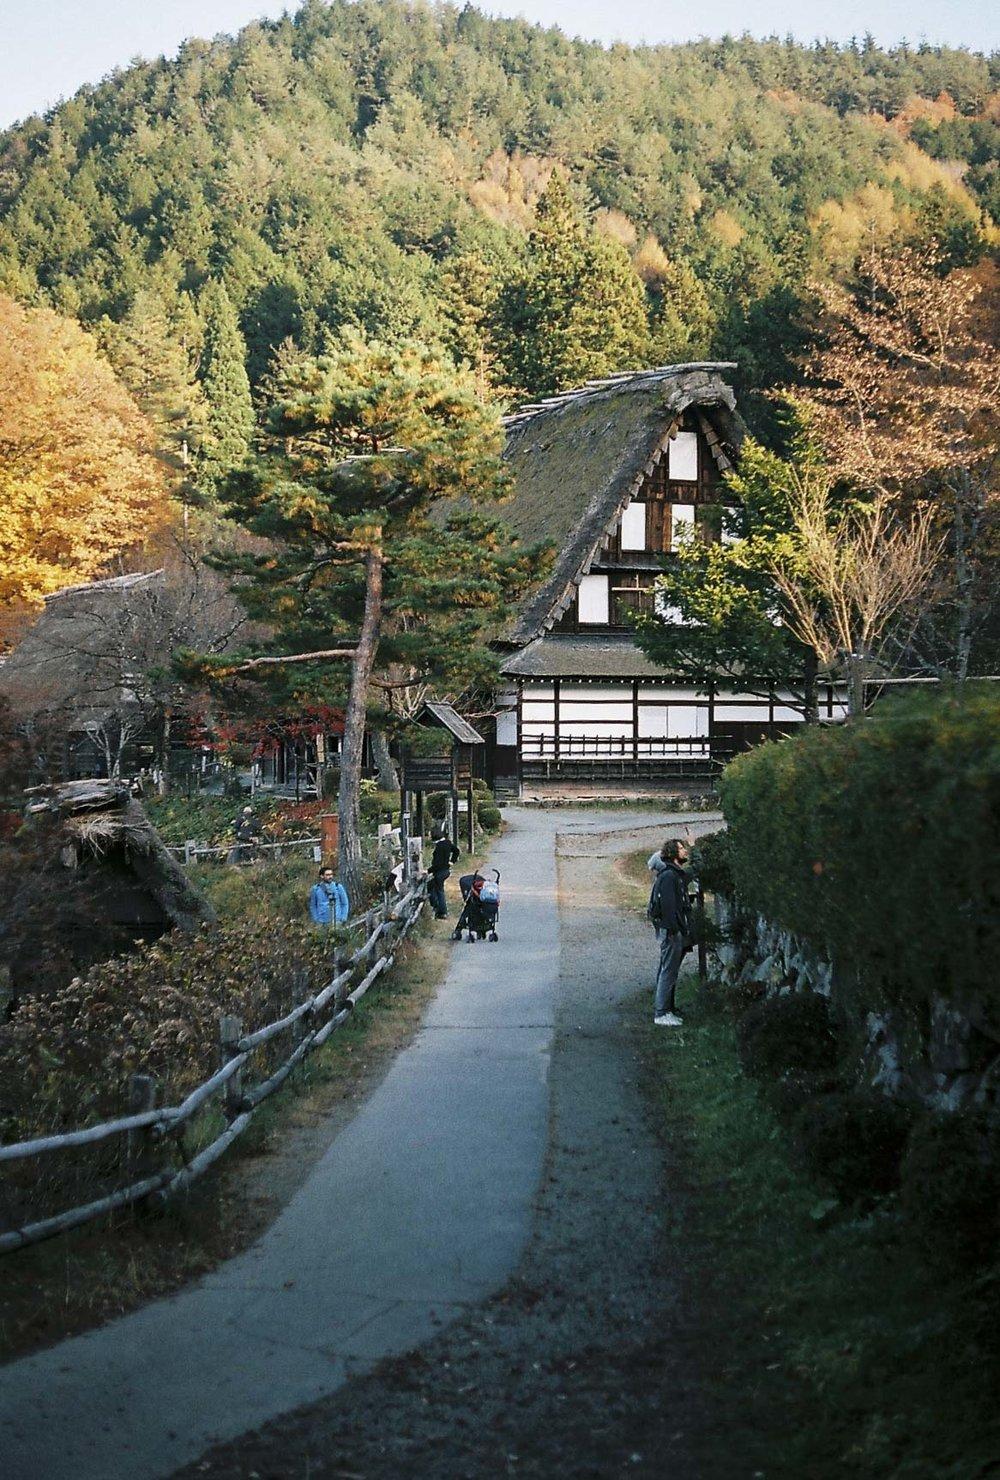 BDAY_LA_JAPAN_SNAP_LQ_286.JPG